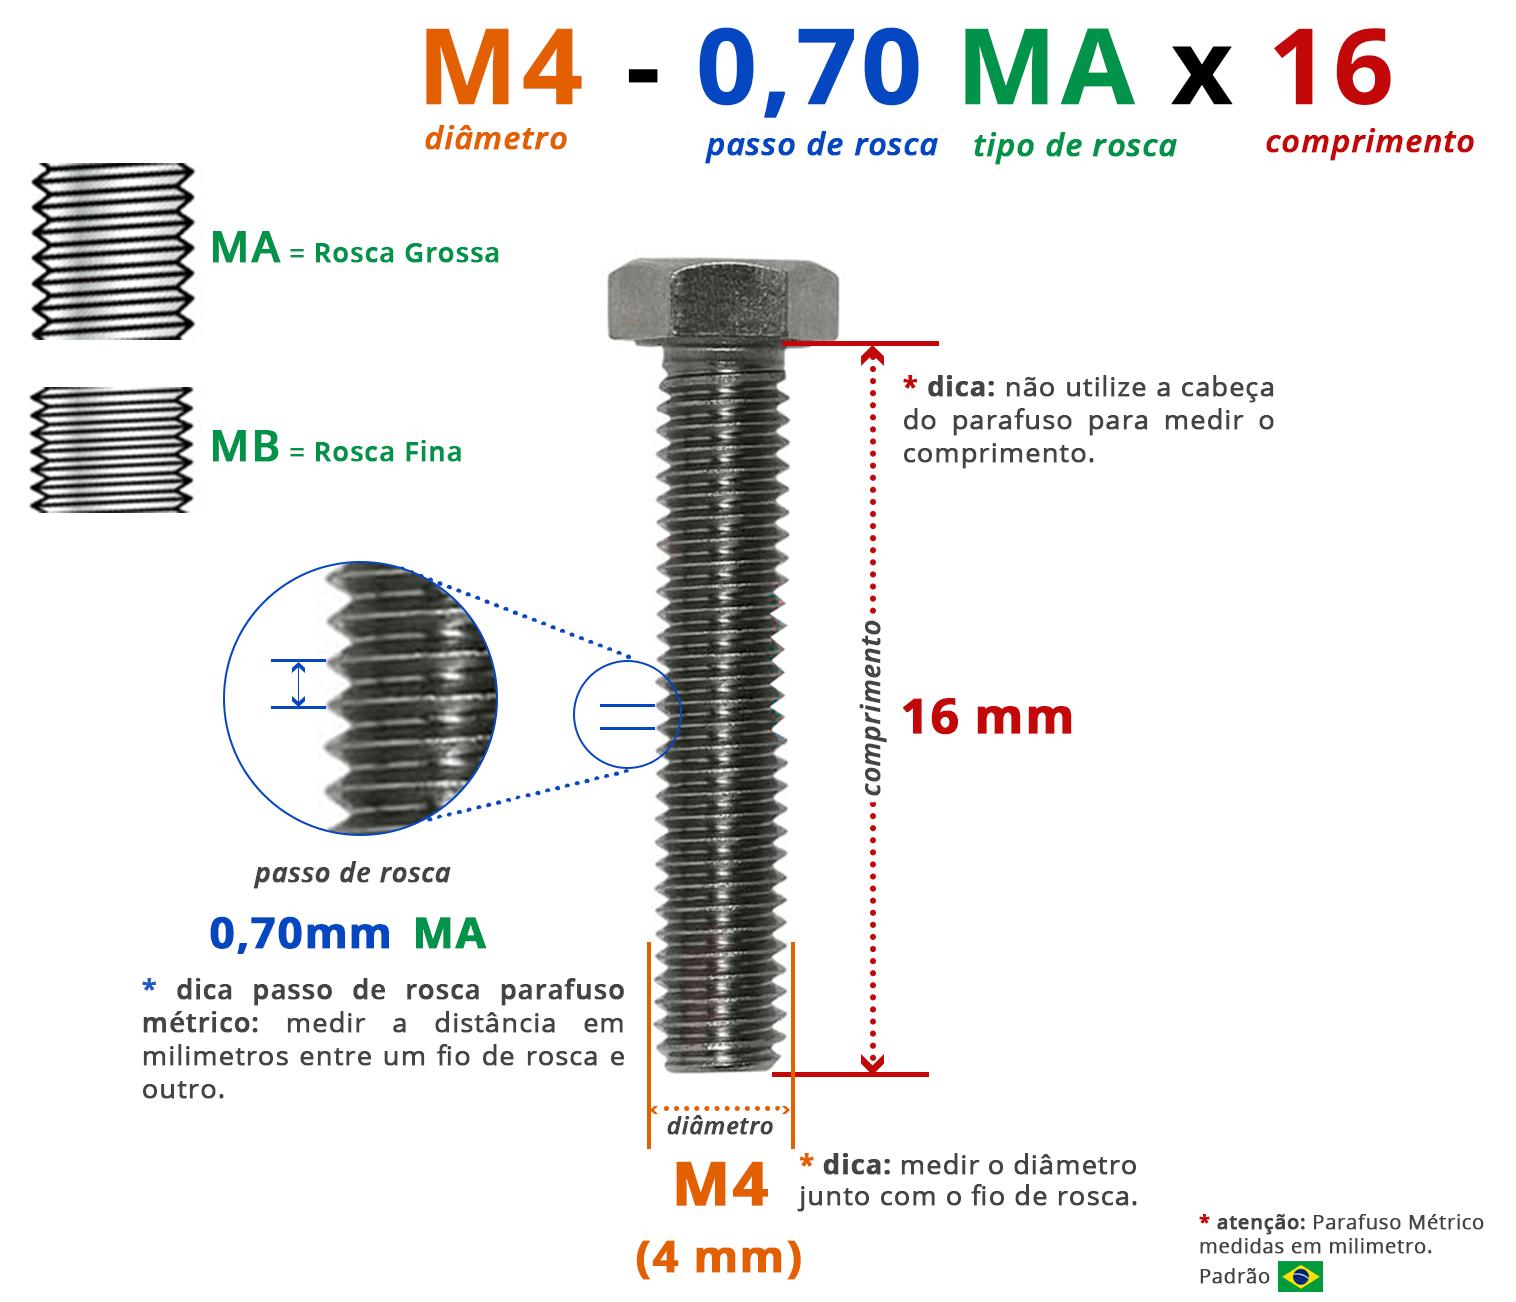 PARAFUSO SEXTAVADO ROSCA INTEIRA M4 0,70 MA X 16 DIN 933 INOX A2